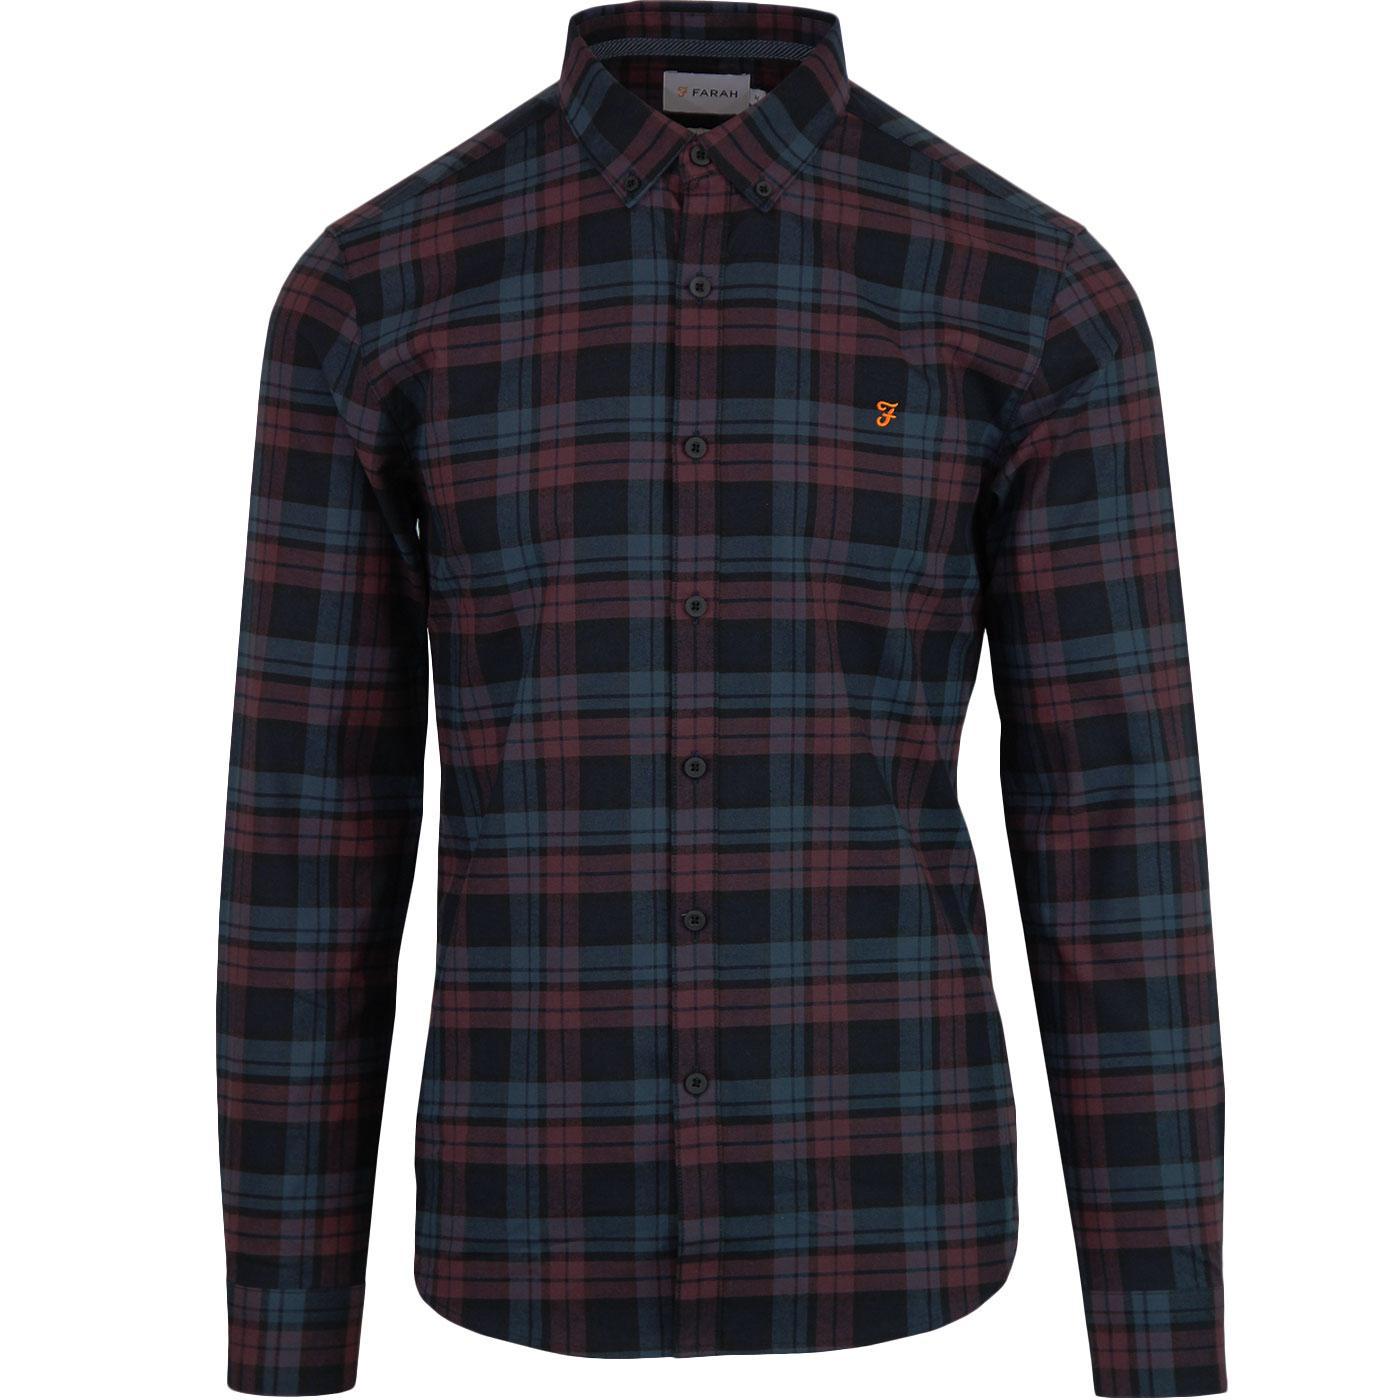 Radley FARAH Retro 70s Slim Fit Check Shirt in Red